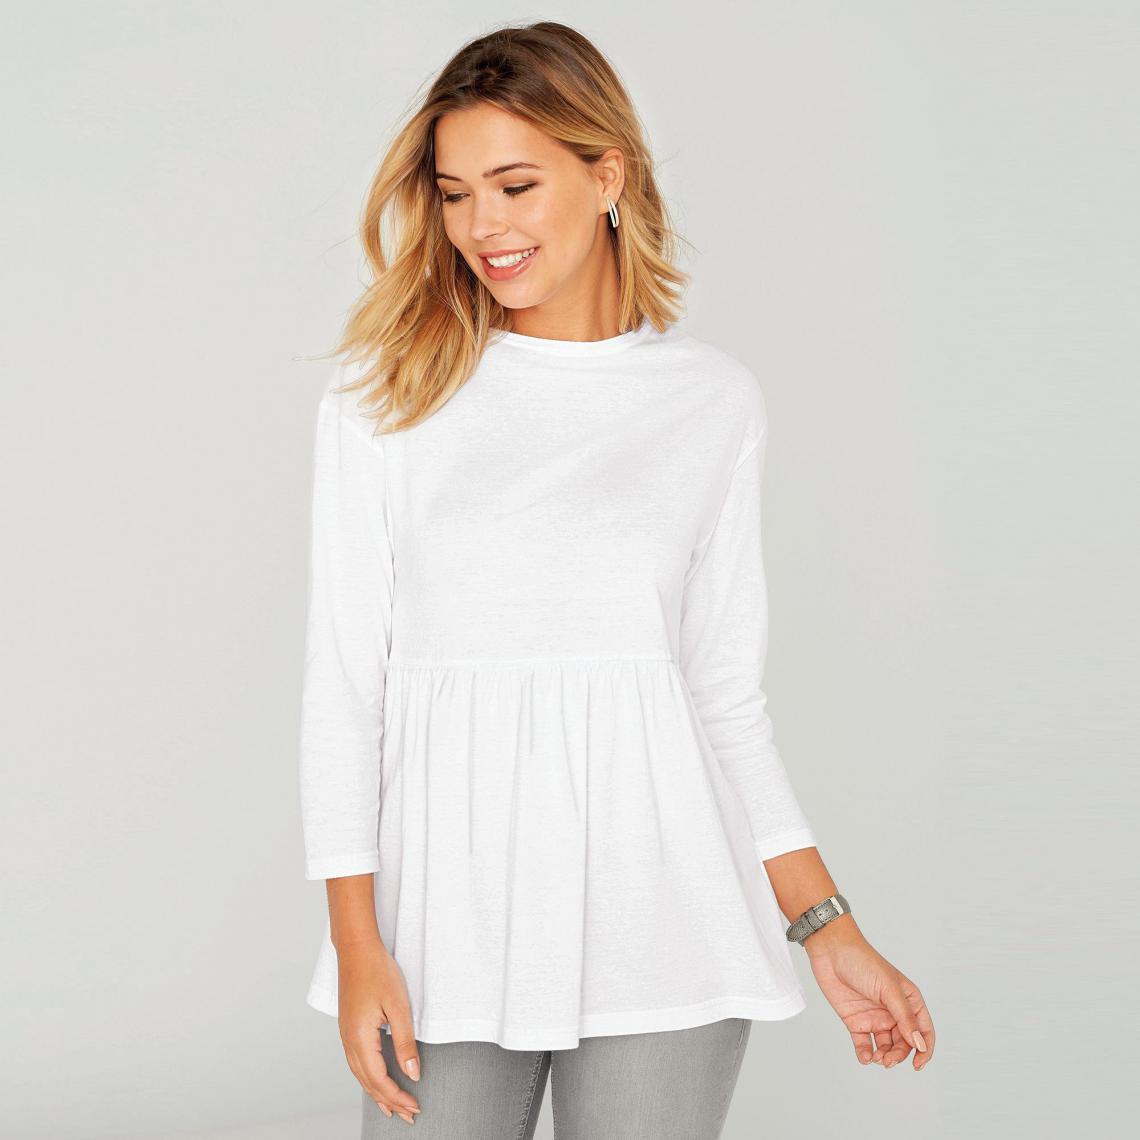 dd89b47fc0f Tee-shirt volant sur bas manches longues femme - Blanc